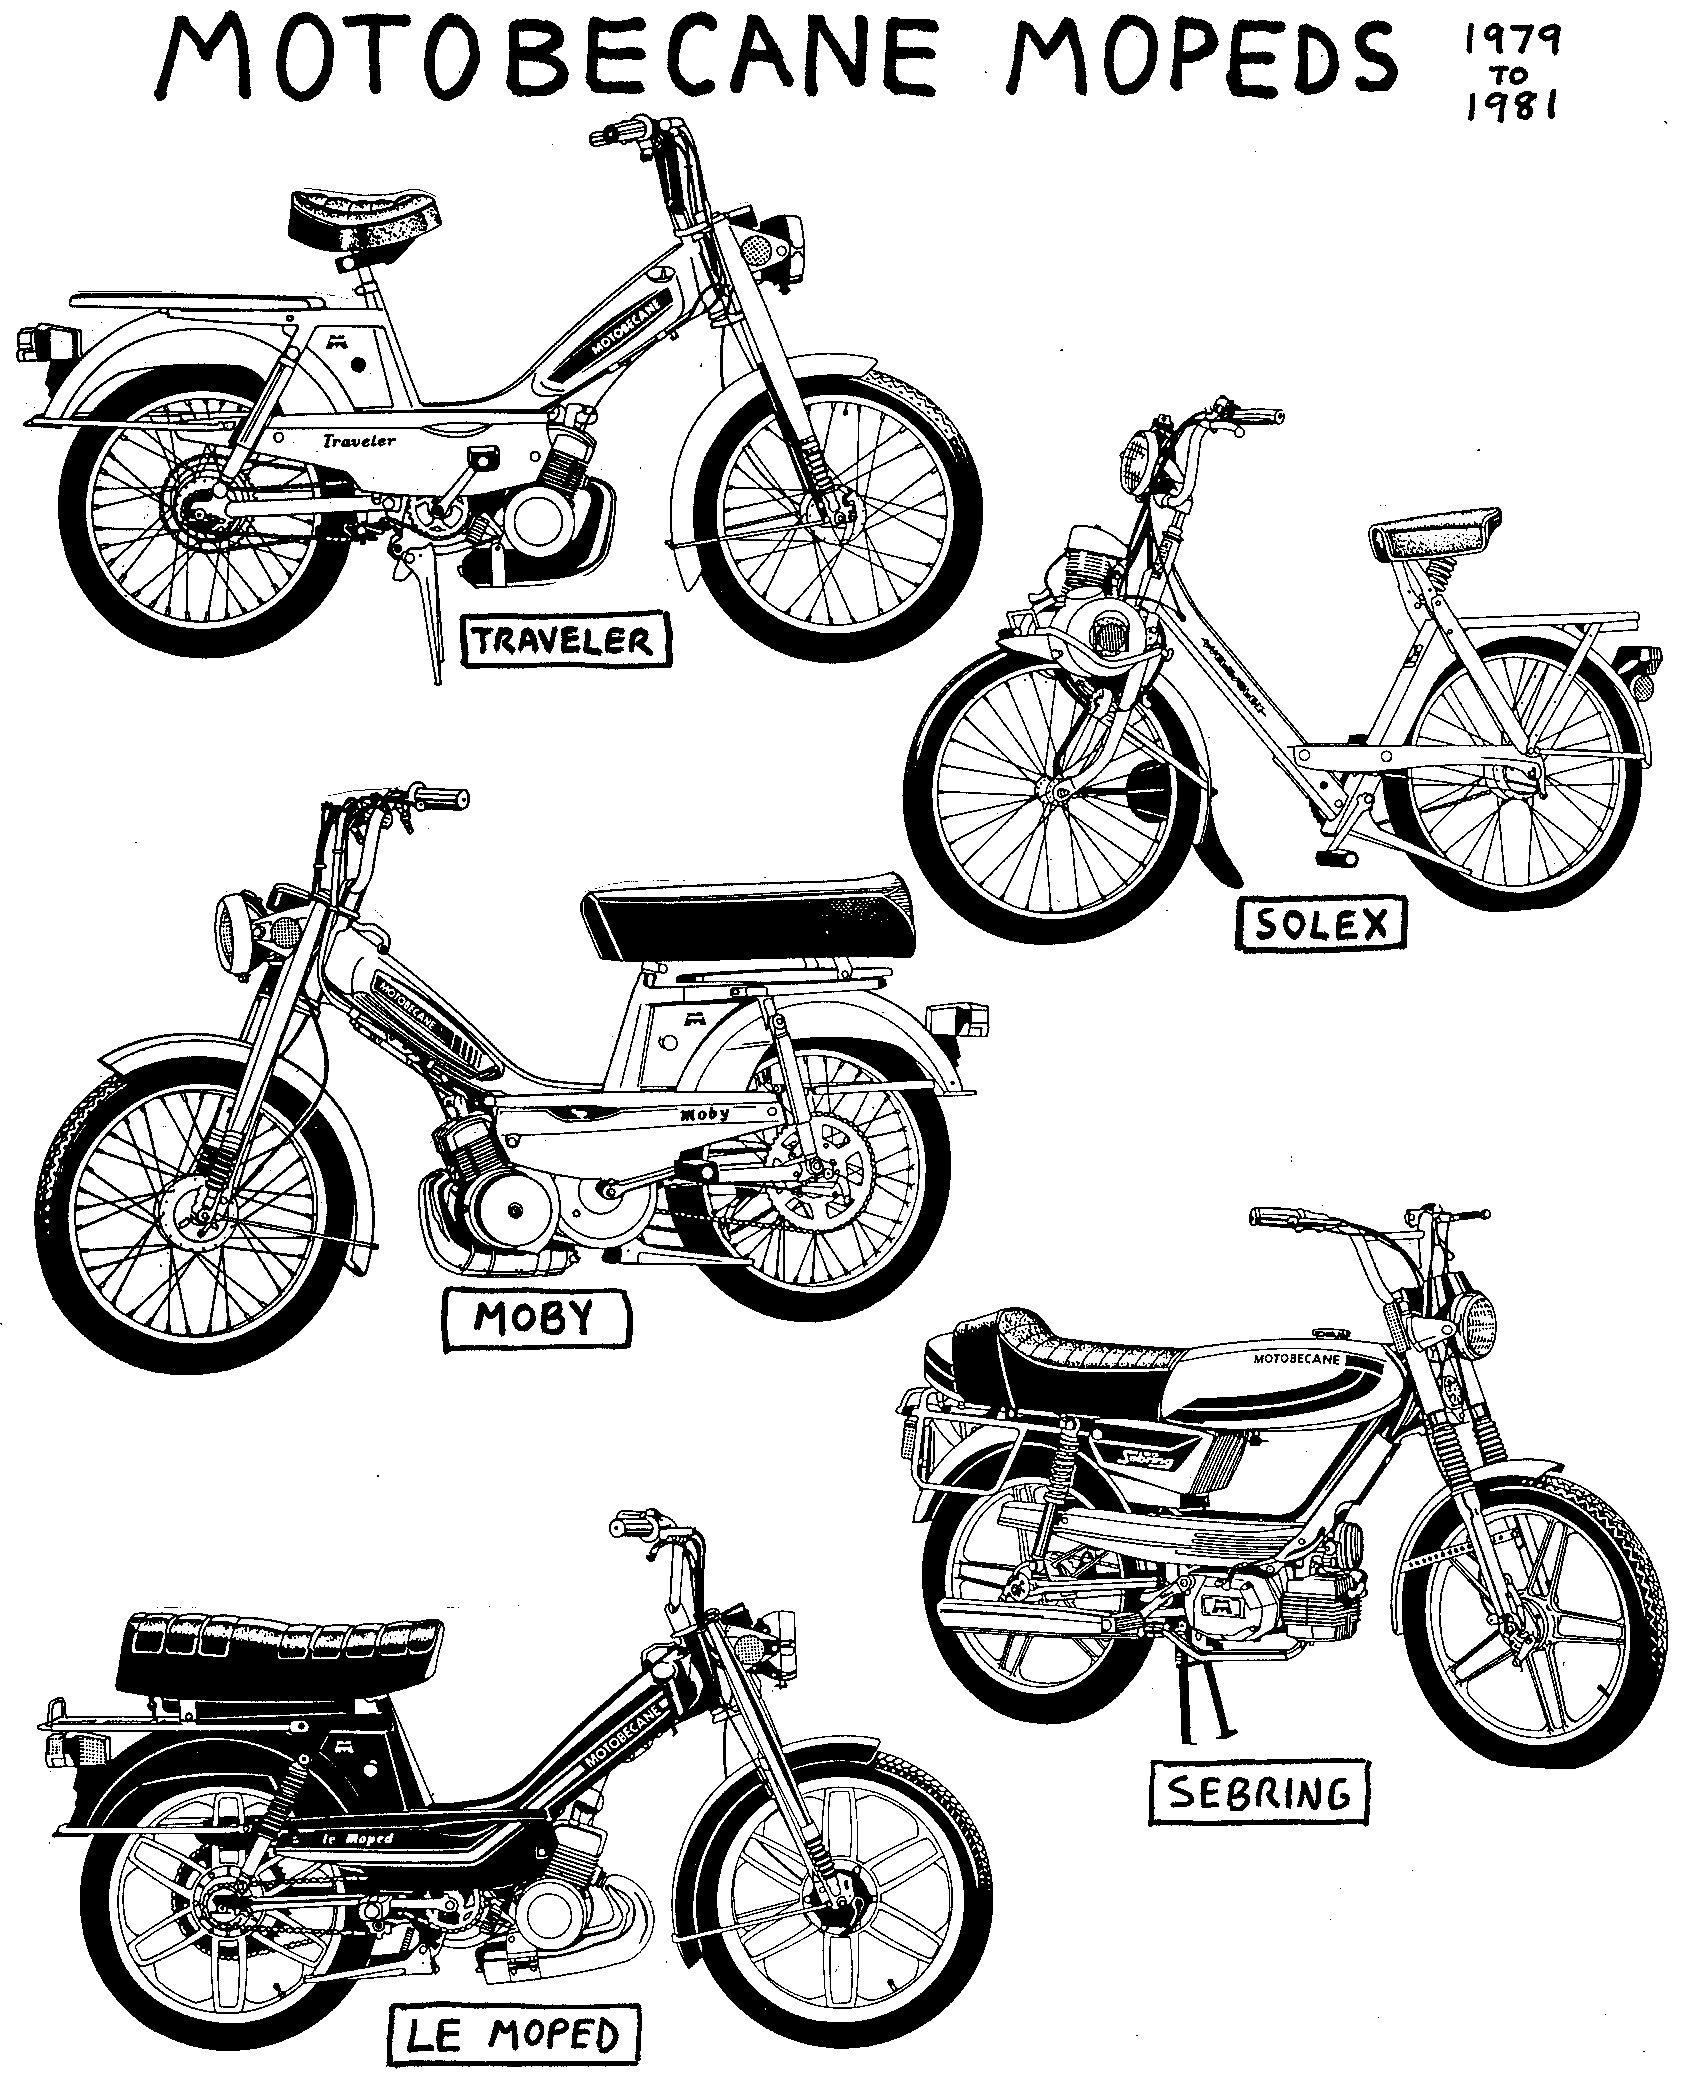 vintage 1976 motobecane 50cc mobylette moped motorini